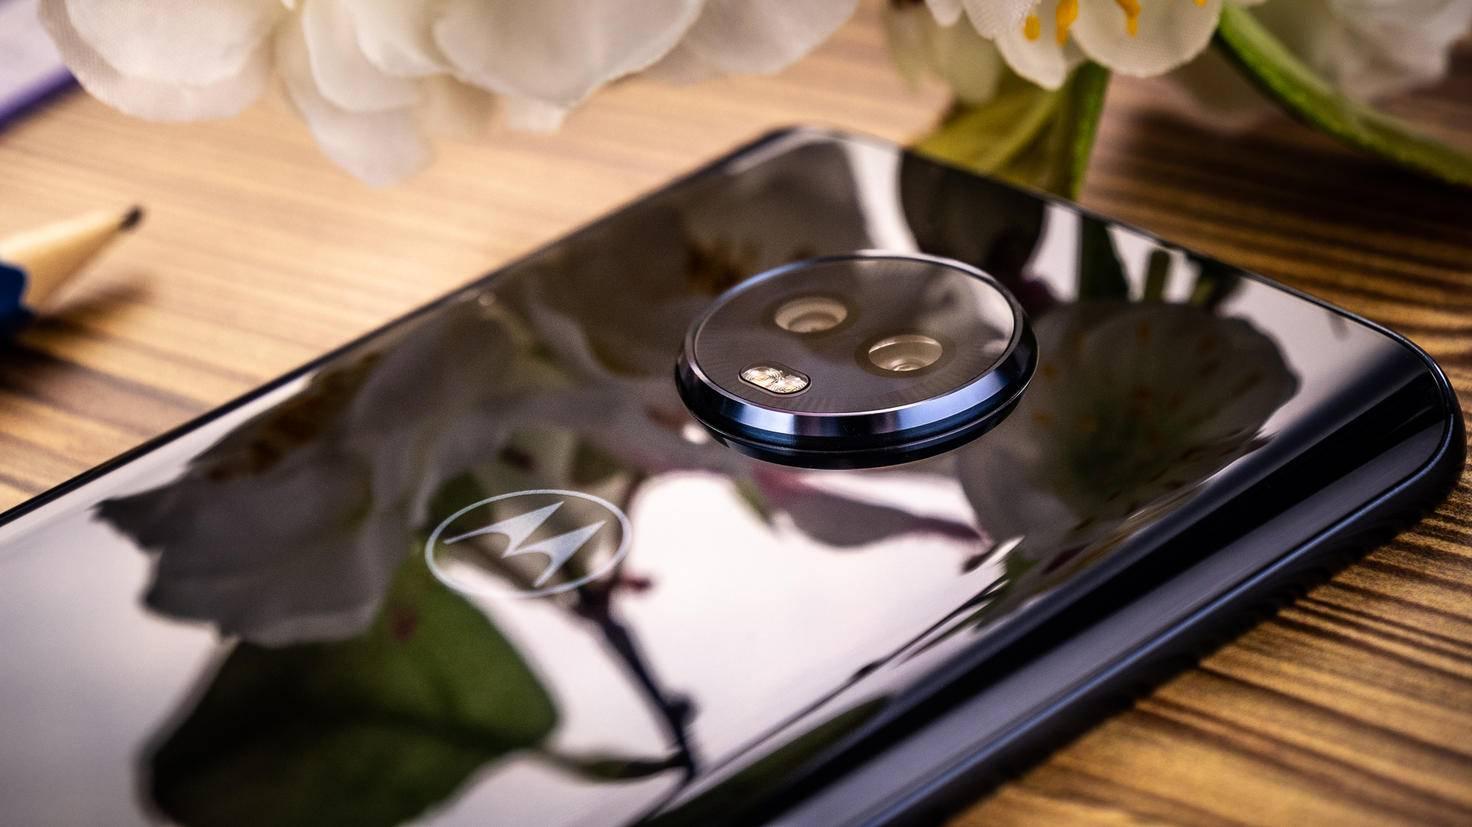 Motorola-Moto-G6-Plus-TURN-ON-3